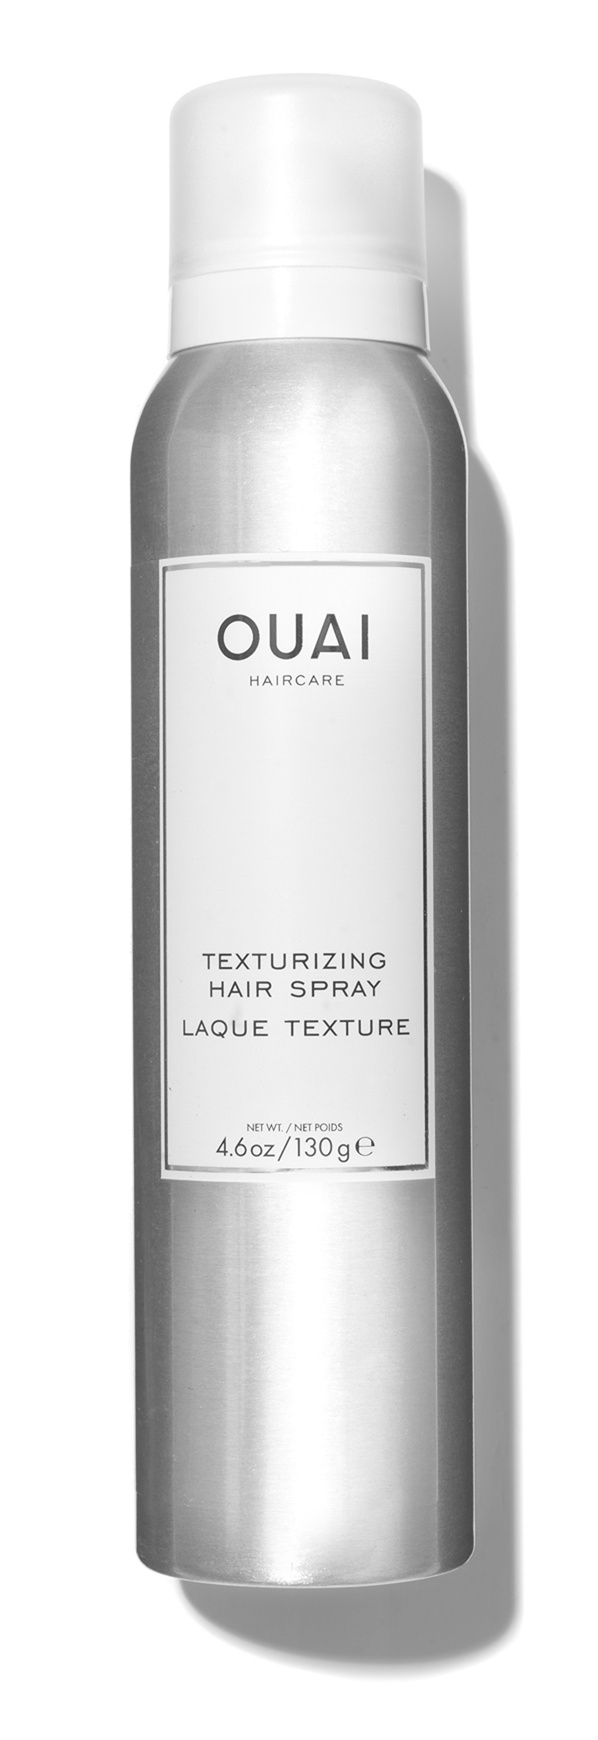 Oaui Texturing Hair Spray